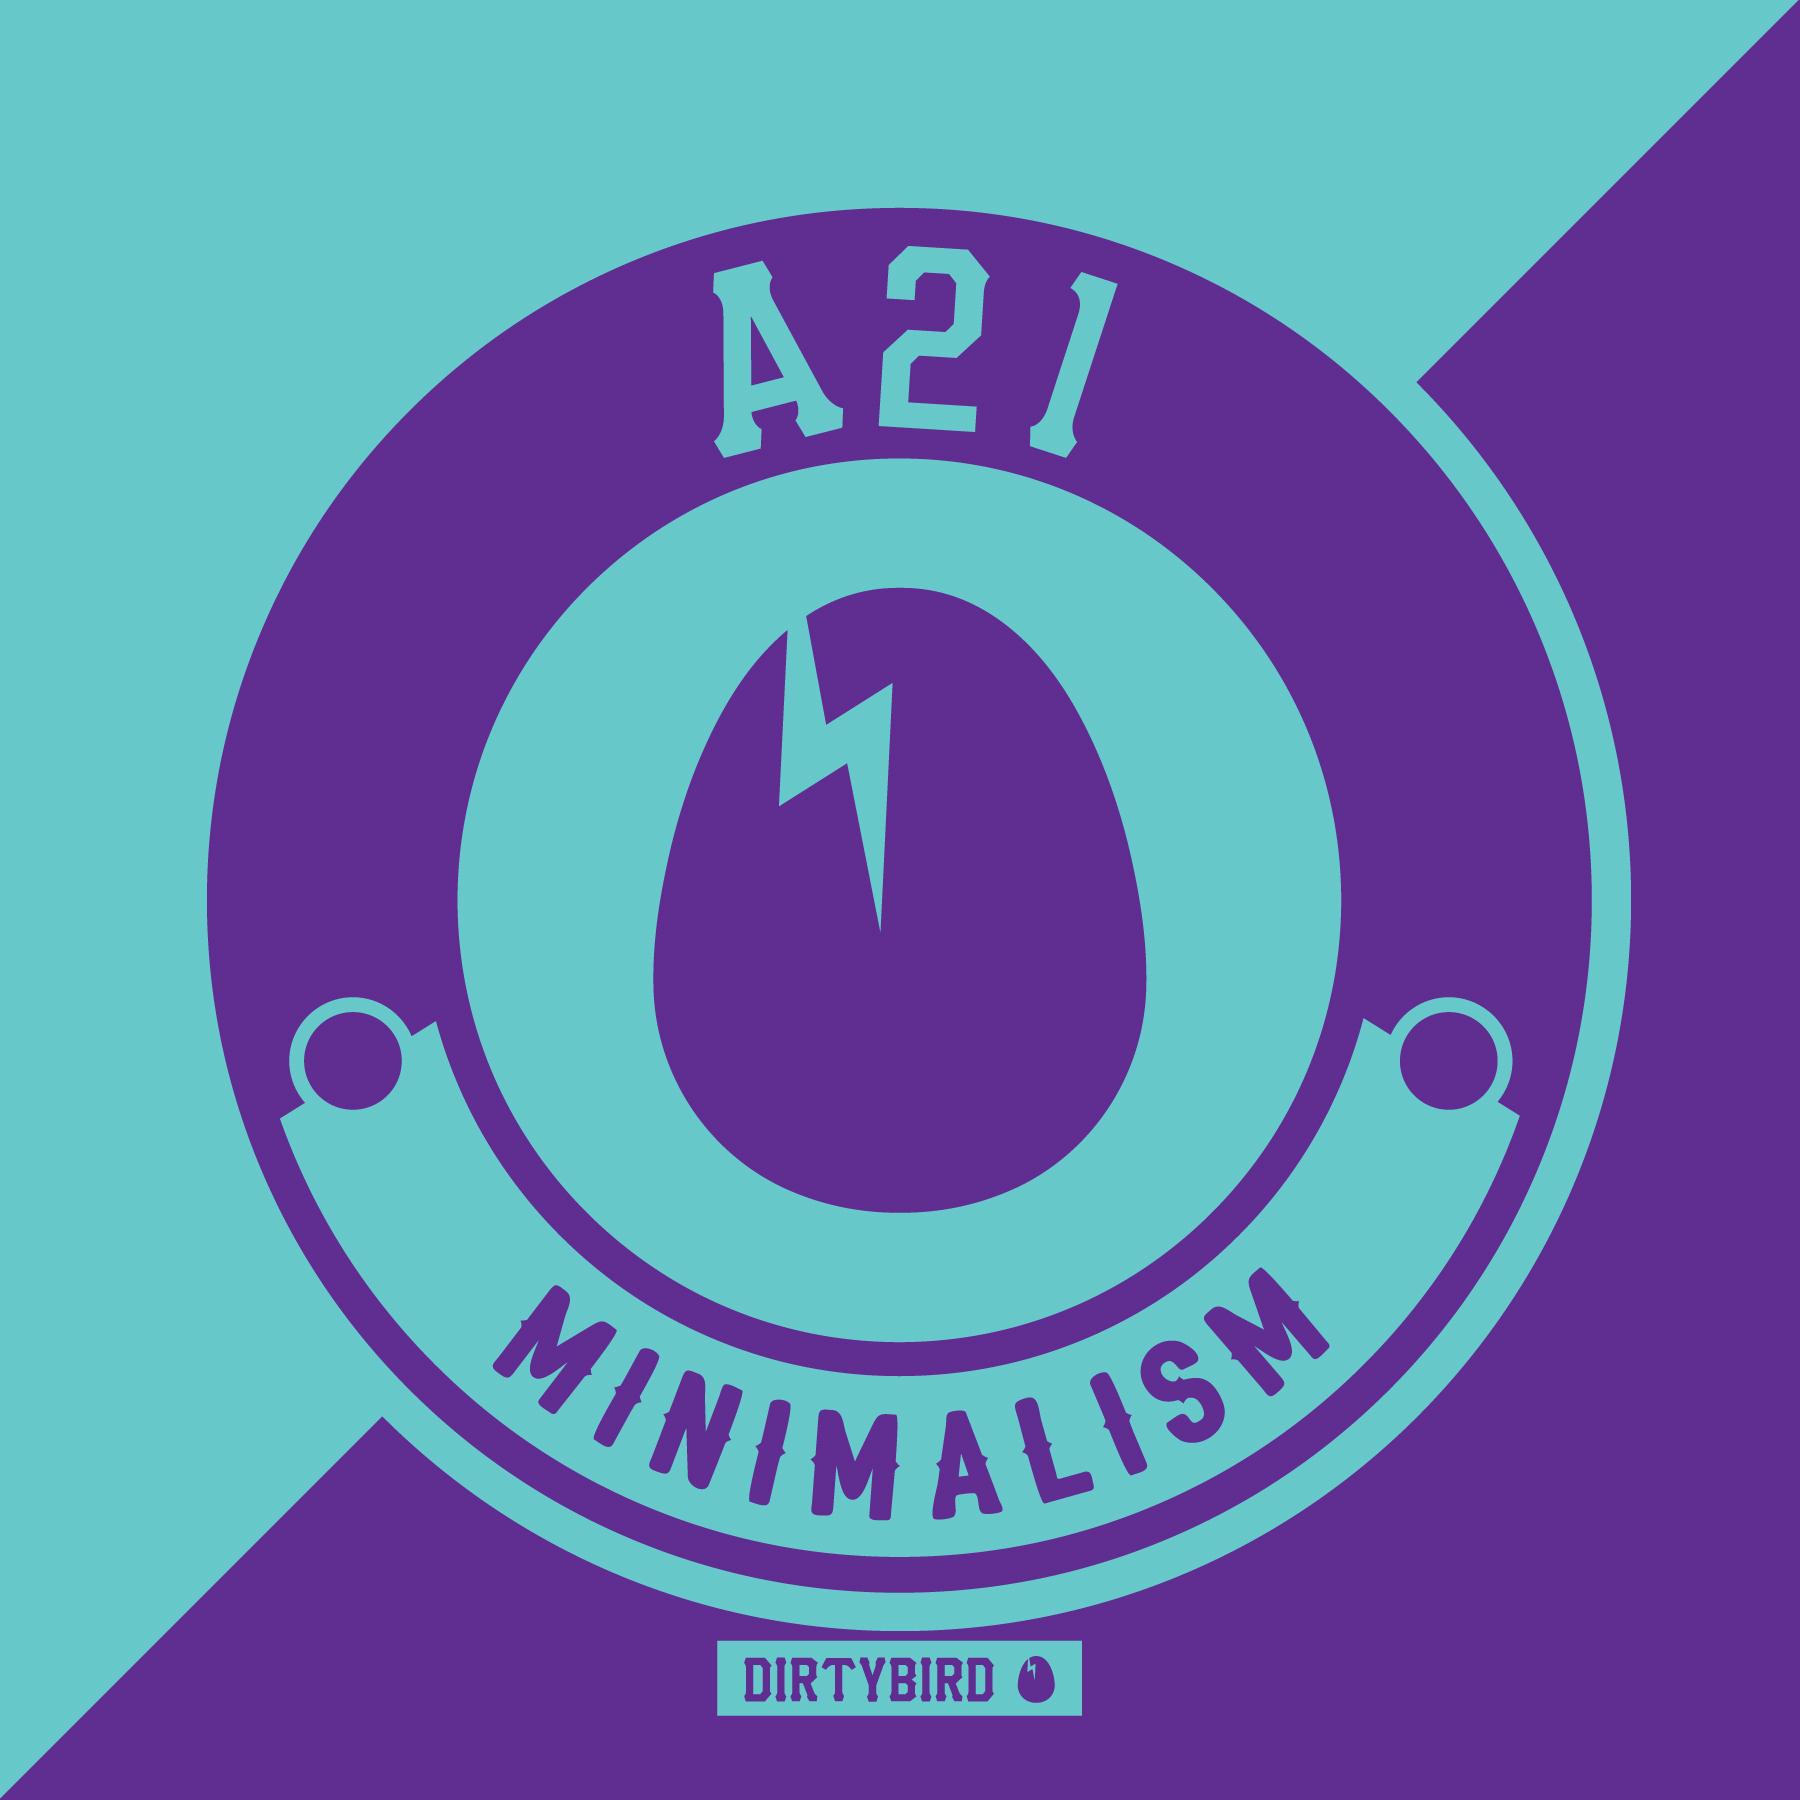 Birdfeed a21 minimalism